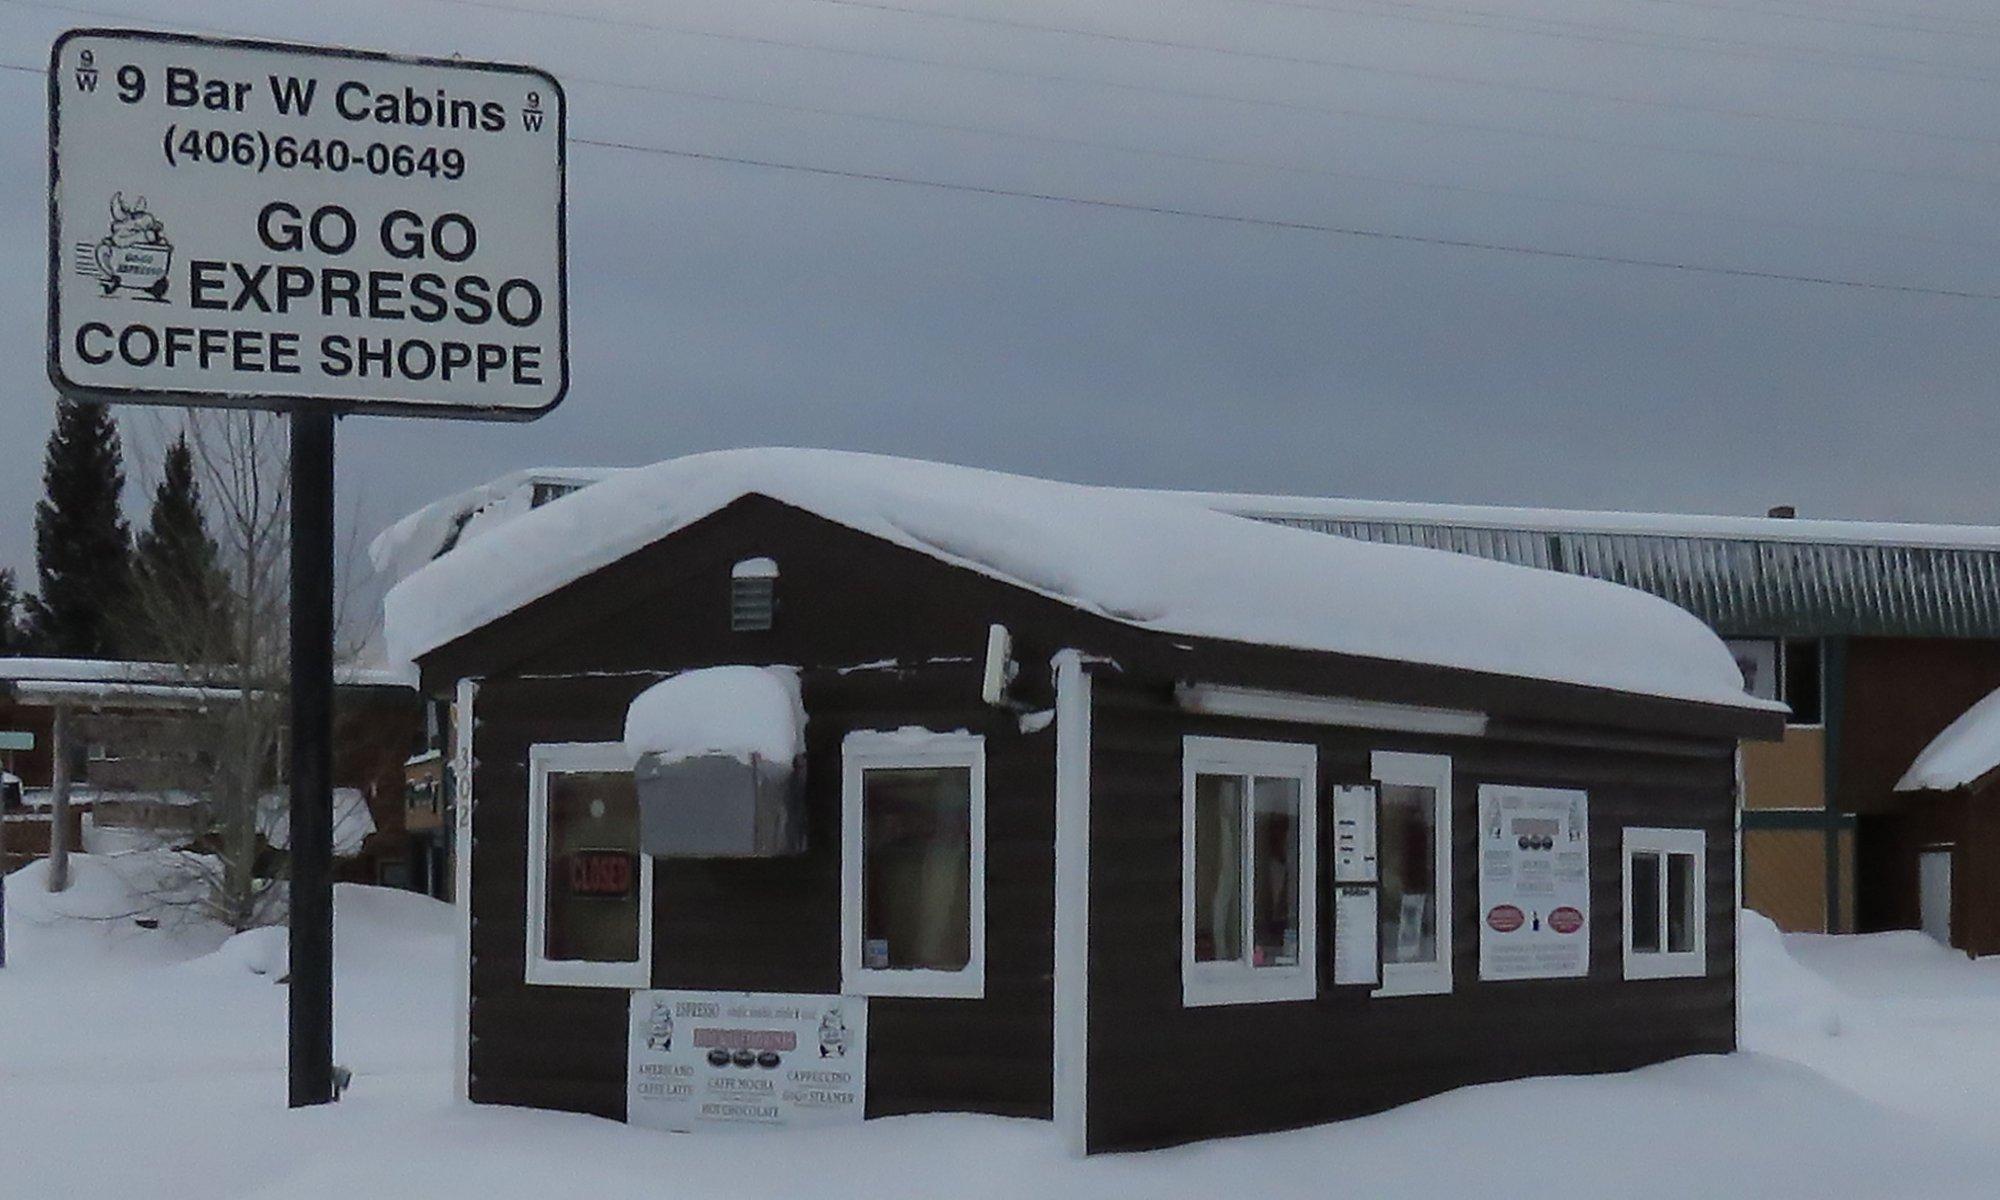 Go Go Expresso Coffee Shoppe Sign and Shack